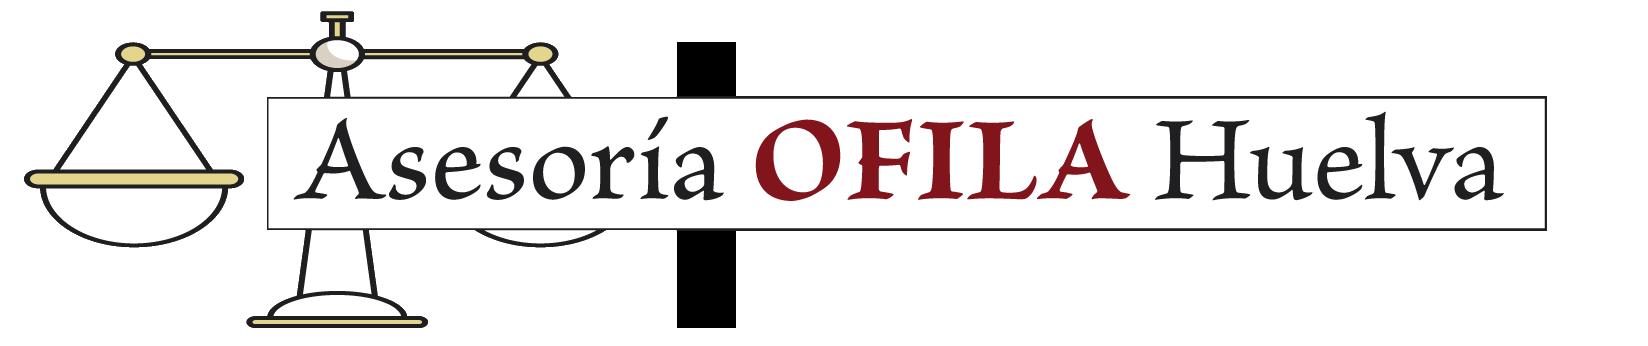 Asesoría OFILA Huelva S. L.